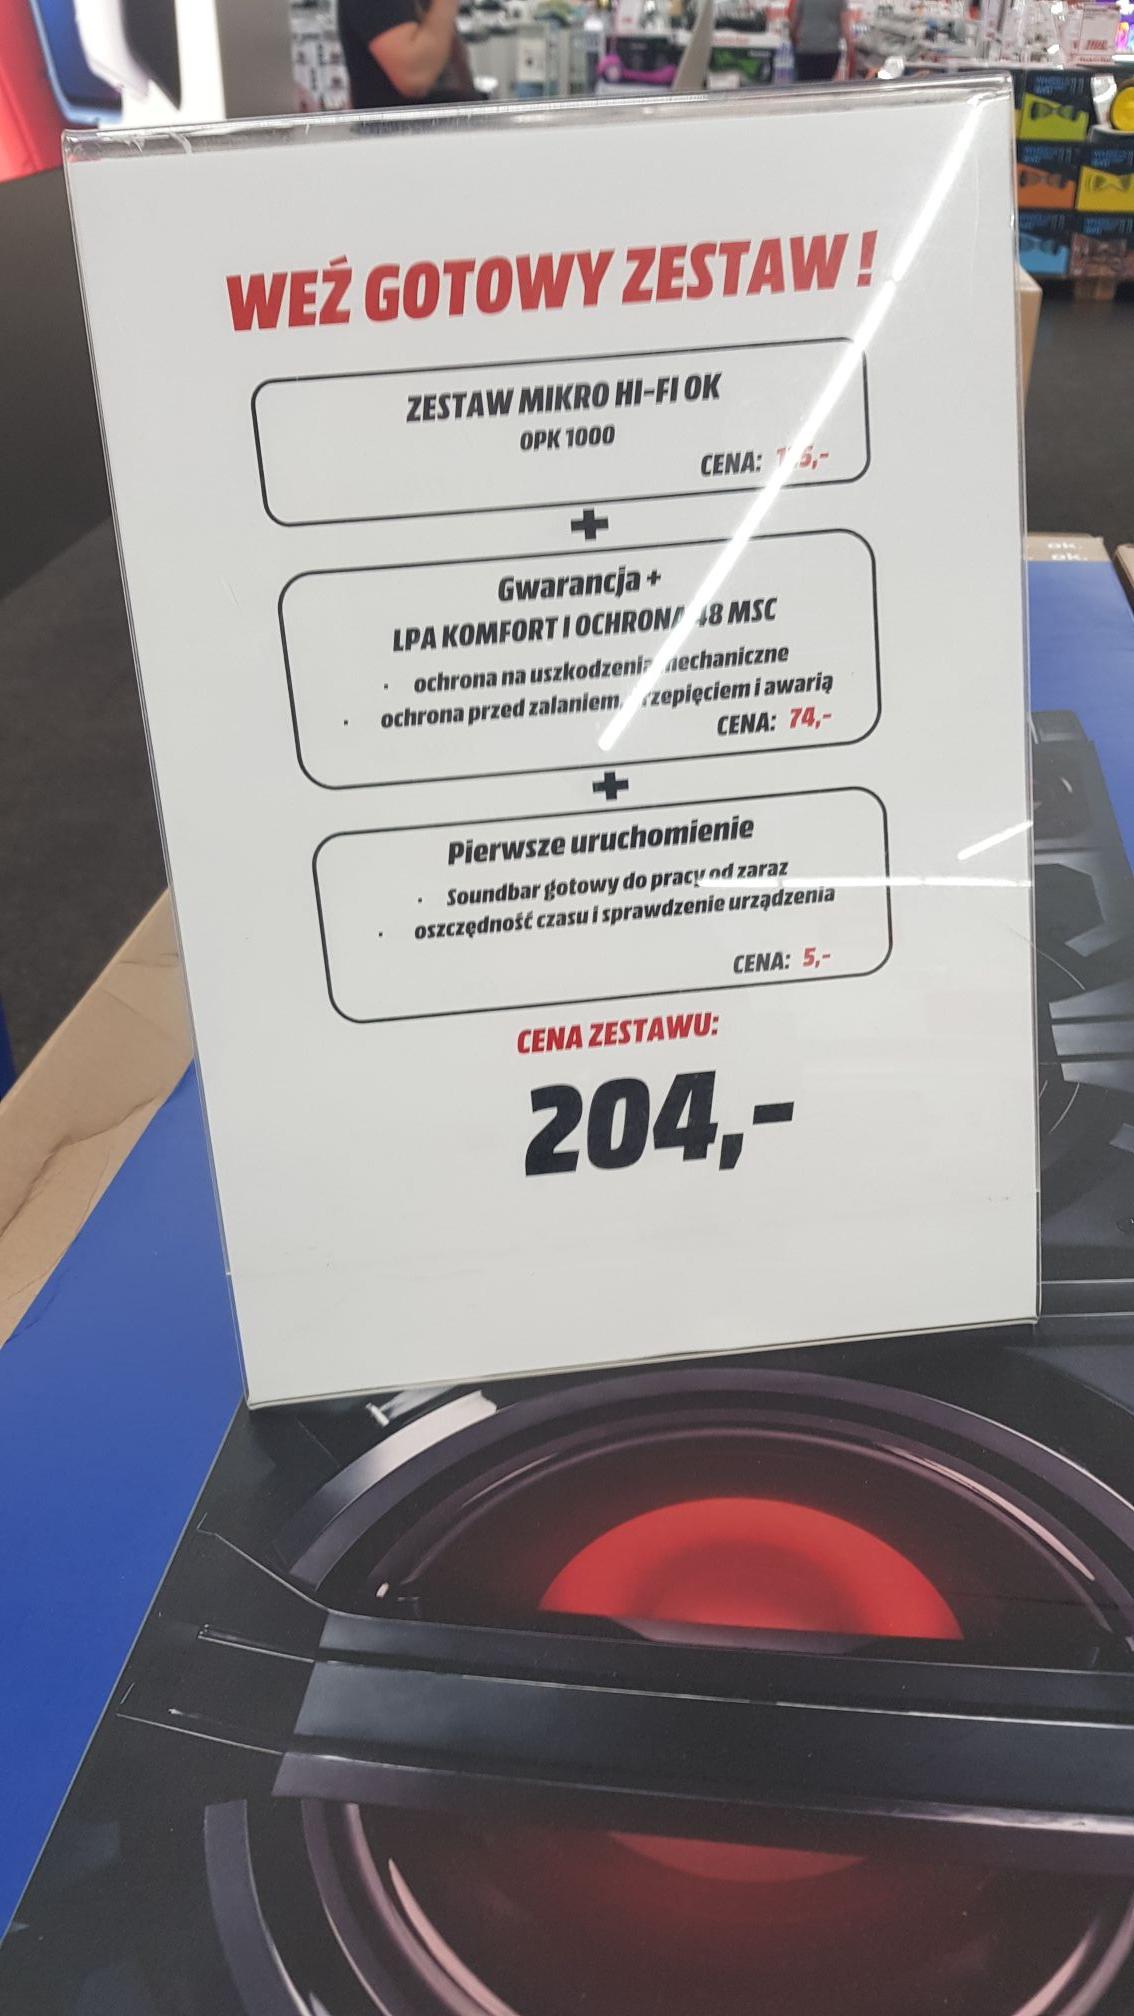 Głośnik Partybox Ok opk1000